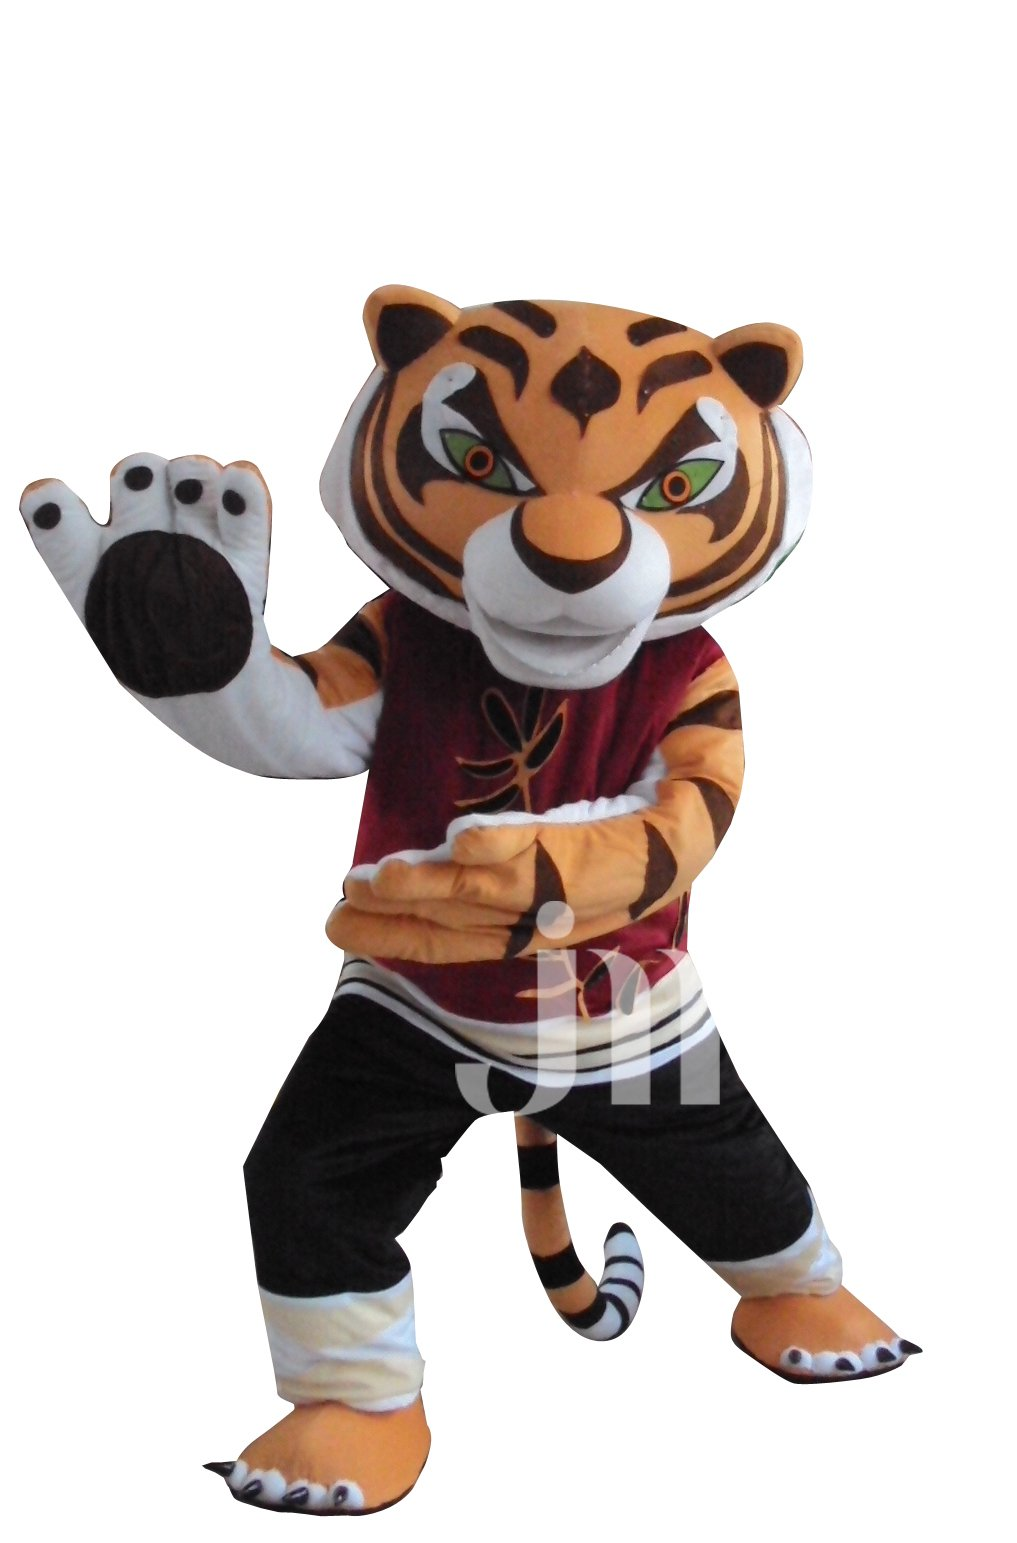 Popular Cartoon Doll Kung Fu Panda Johnson Tiger Walking Doll Cartoon Clothing Sets Head Cute Tiger-jiao Mascot Costume